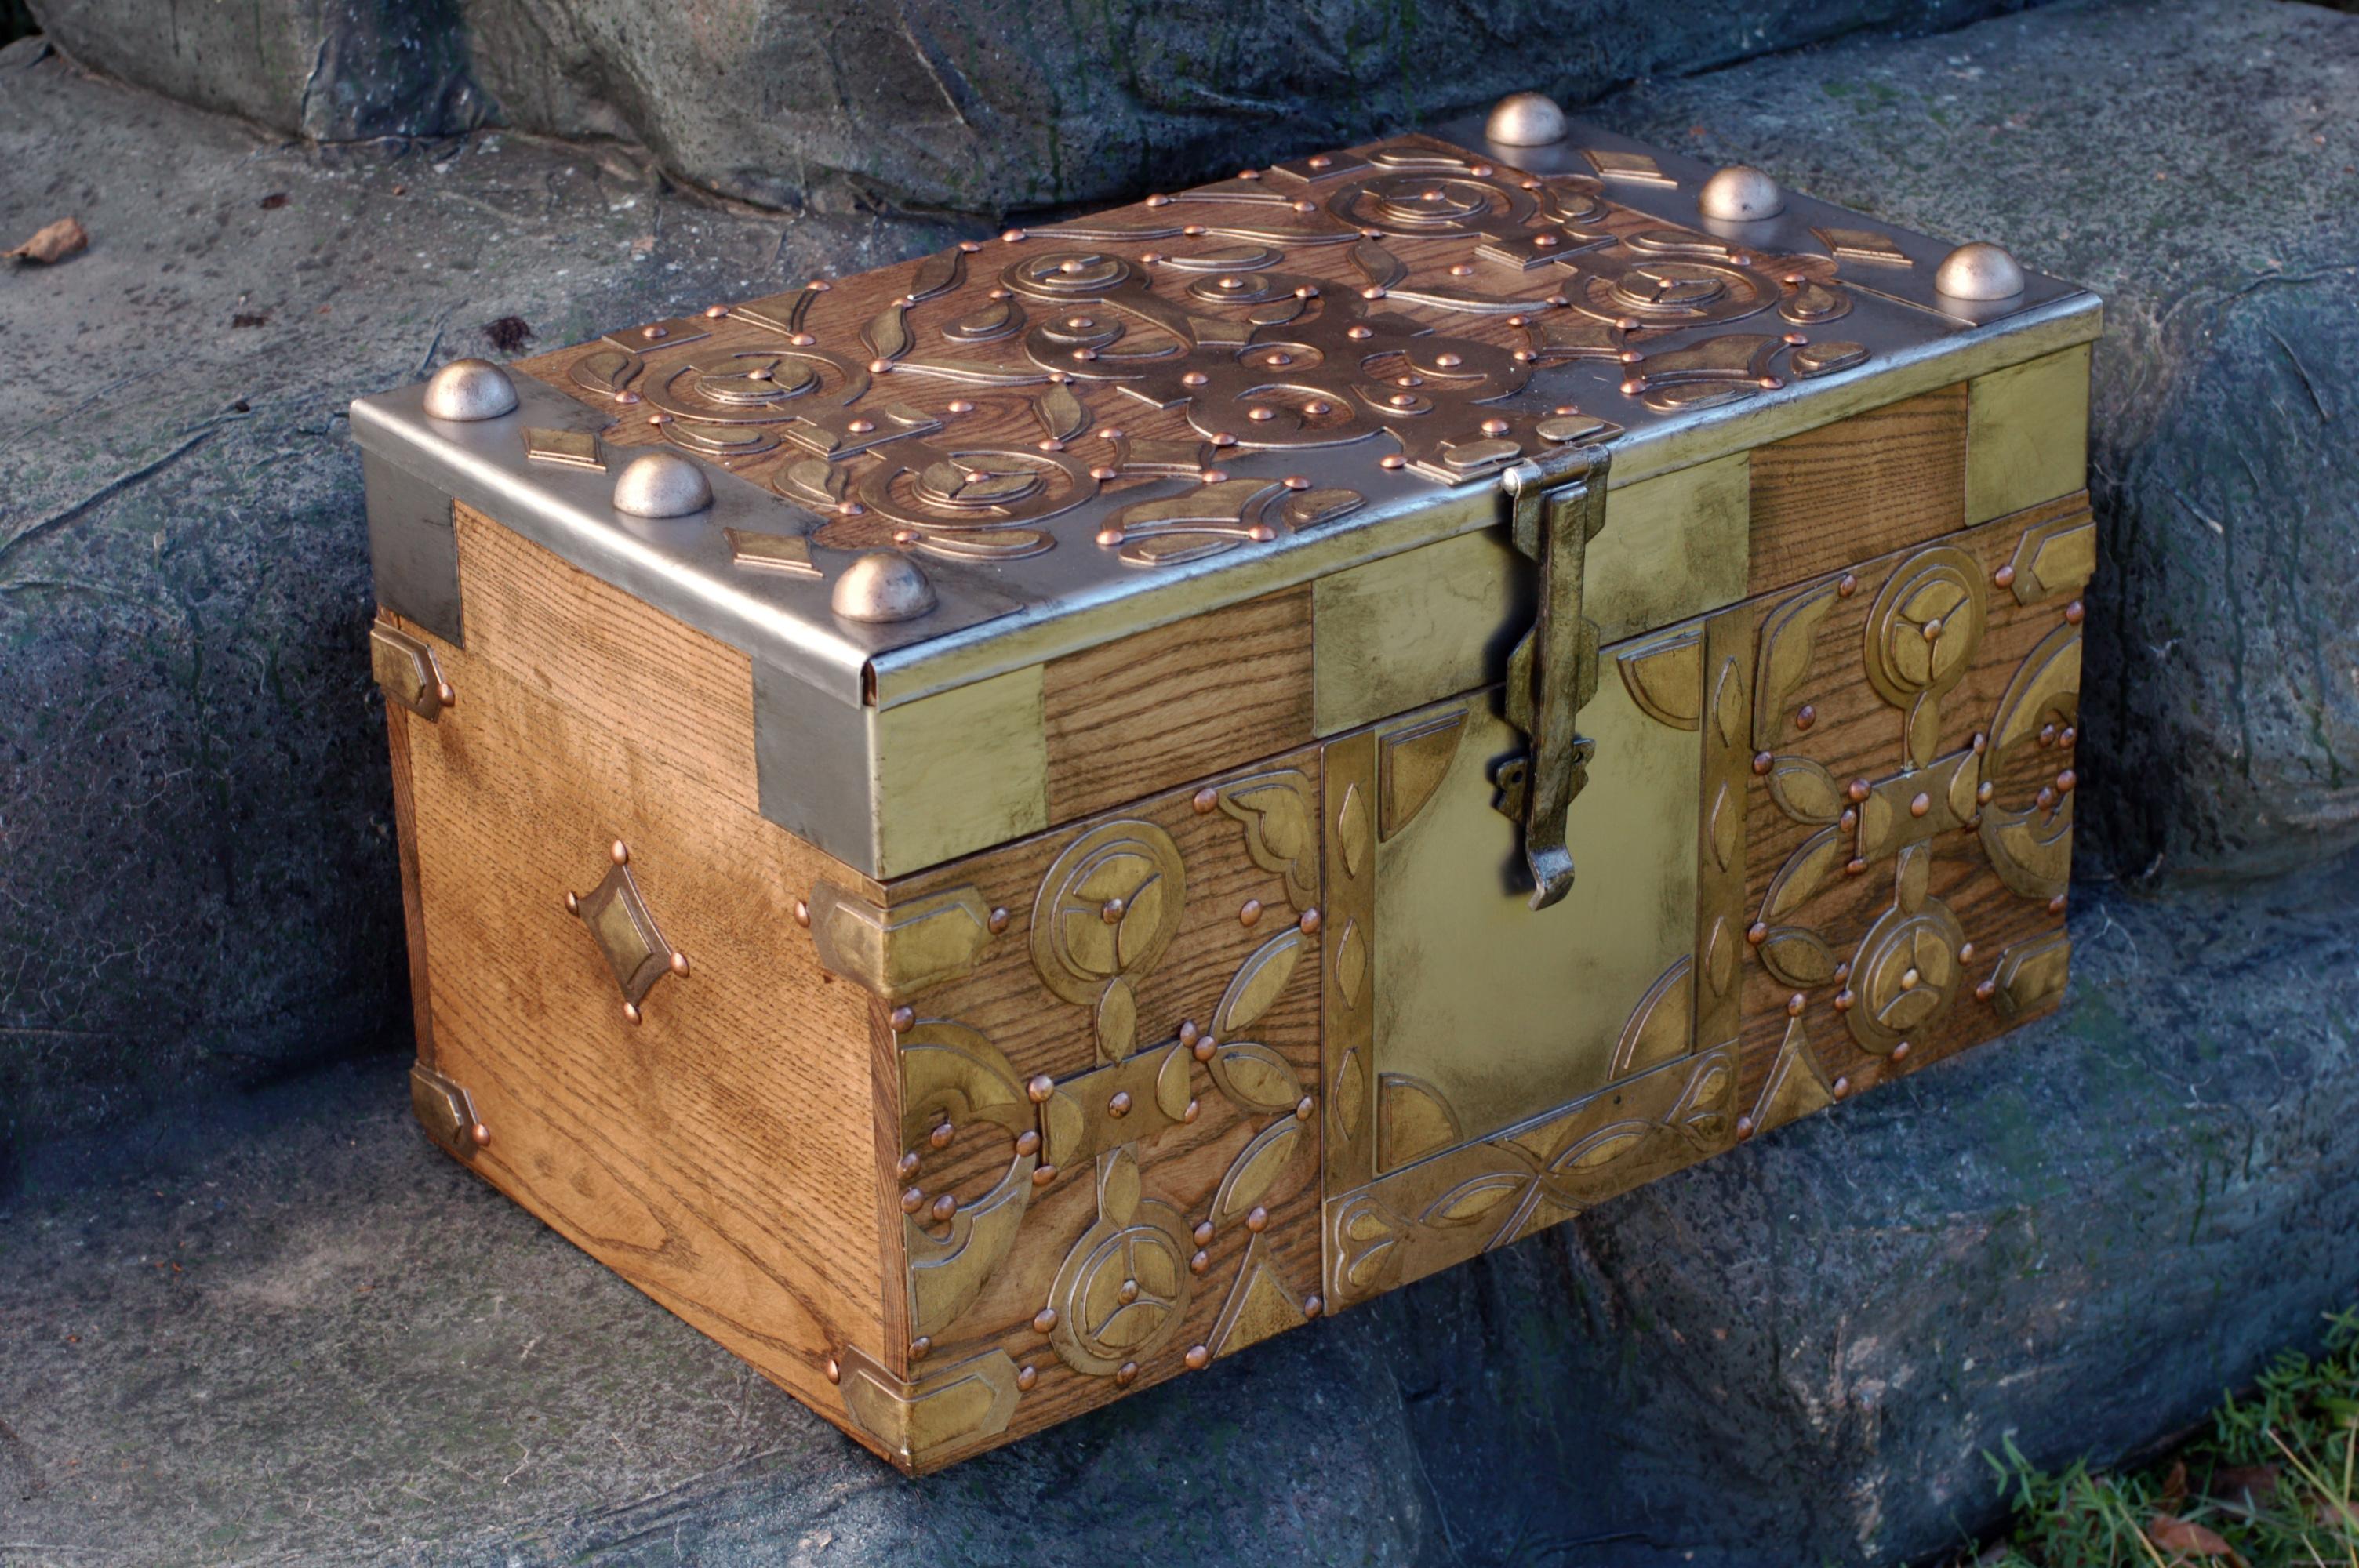 Daenerys' chest of dragon eggs